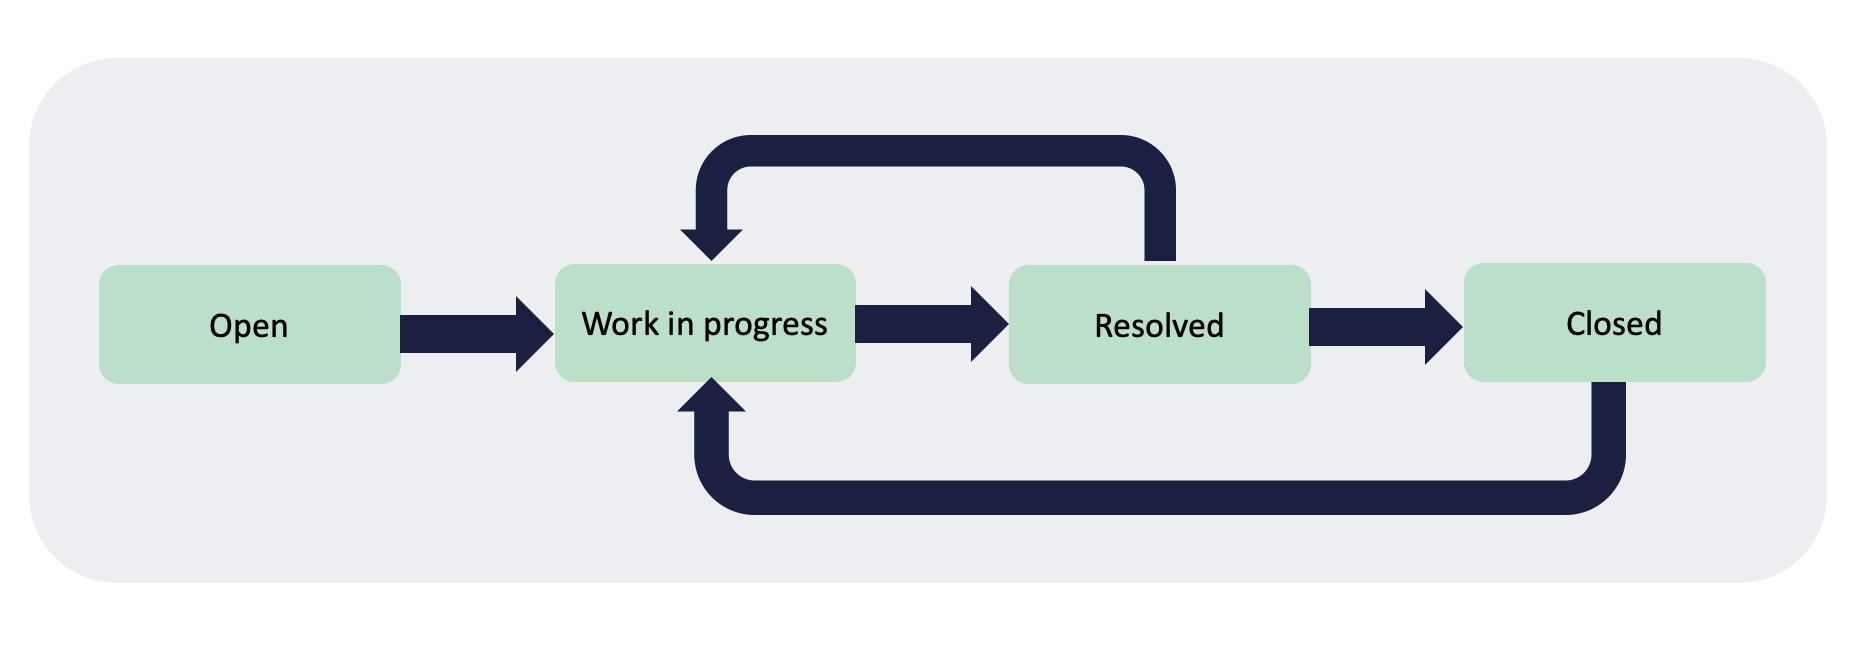 Incident management state model flow.